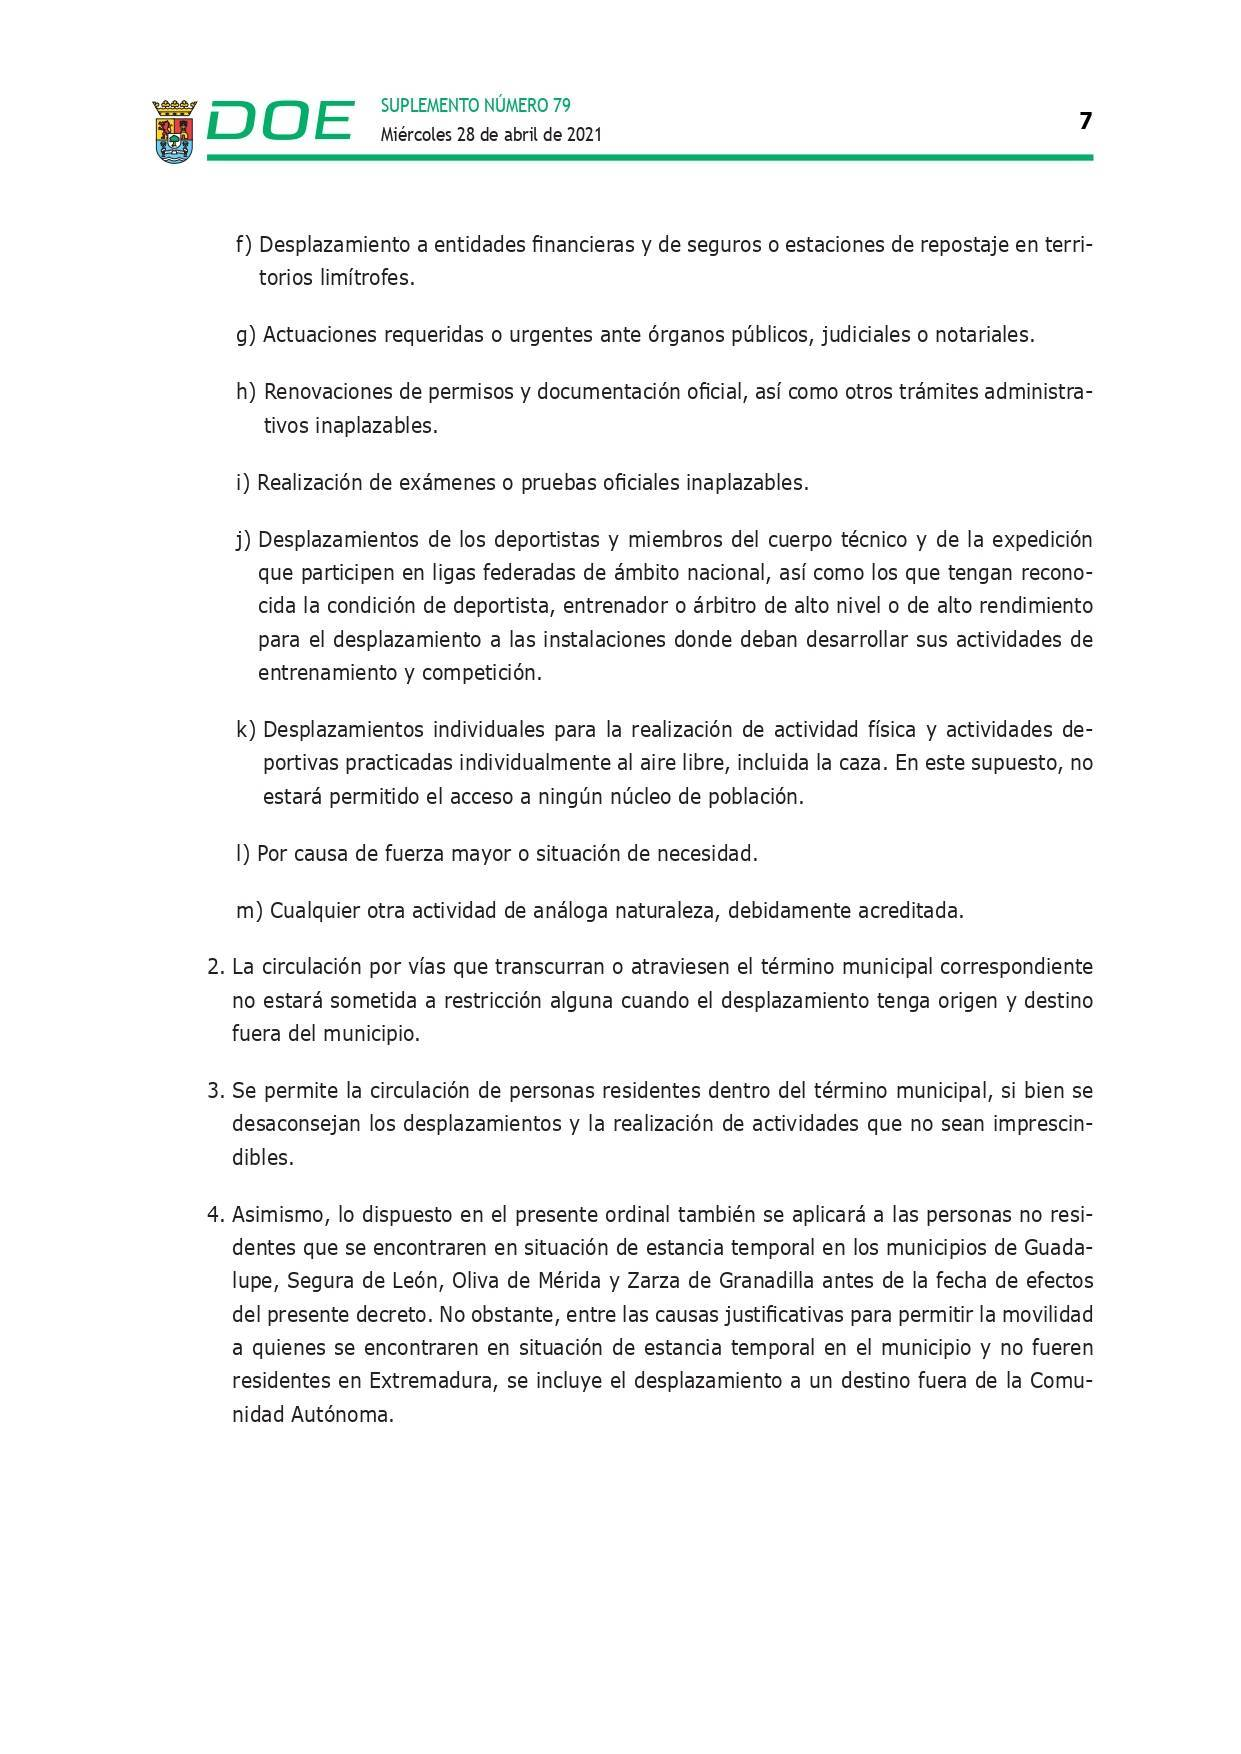 Cierre perimetral por COVID-19 (abril 2021) - Guadalupe (Cáceres) 7